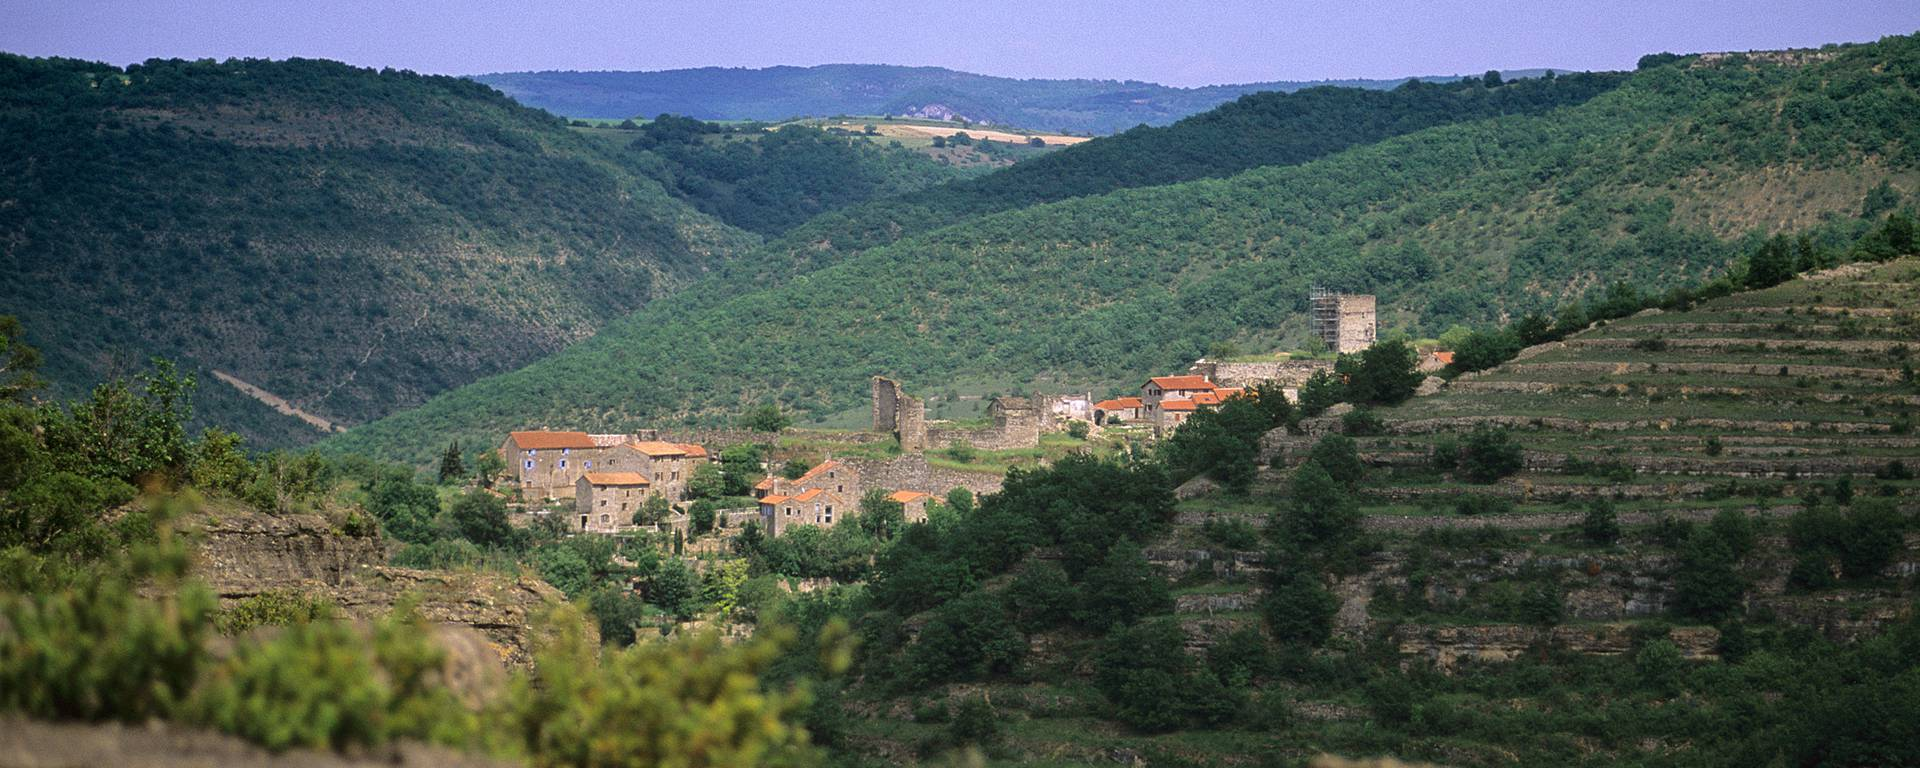 Auriac dans la vallée du Tarn